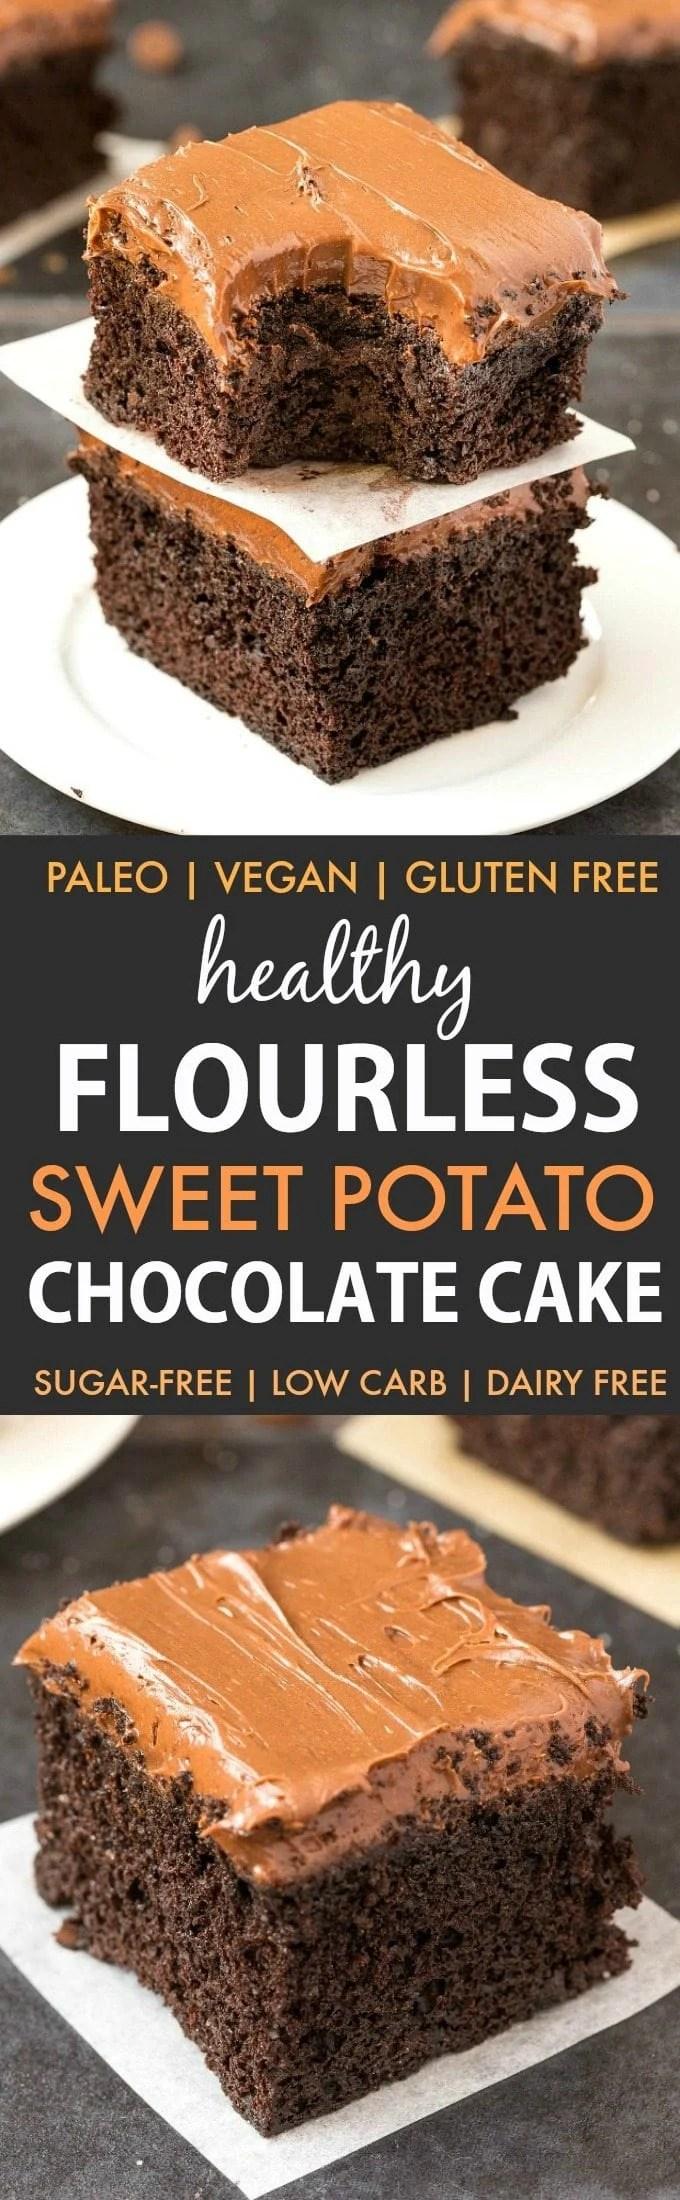 Diet Flourless Chocolate Cake